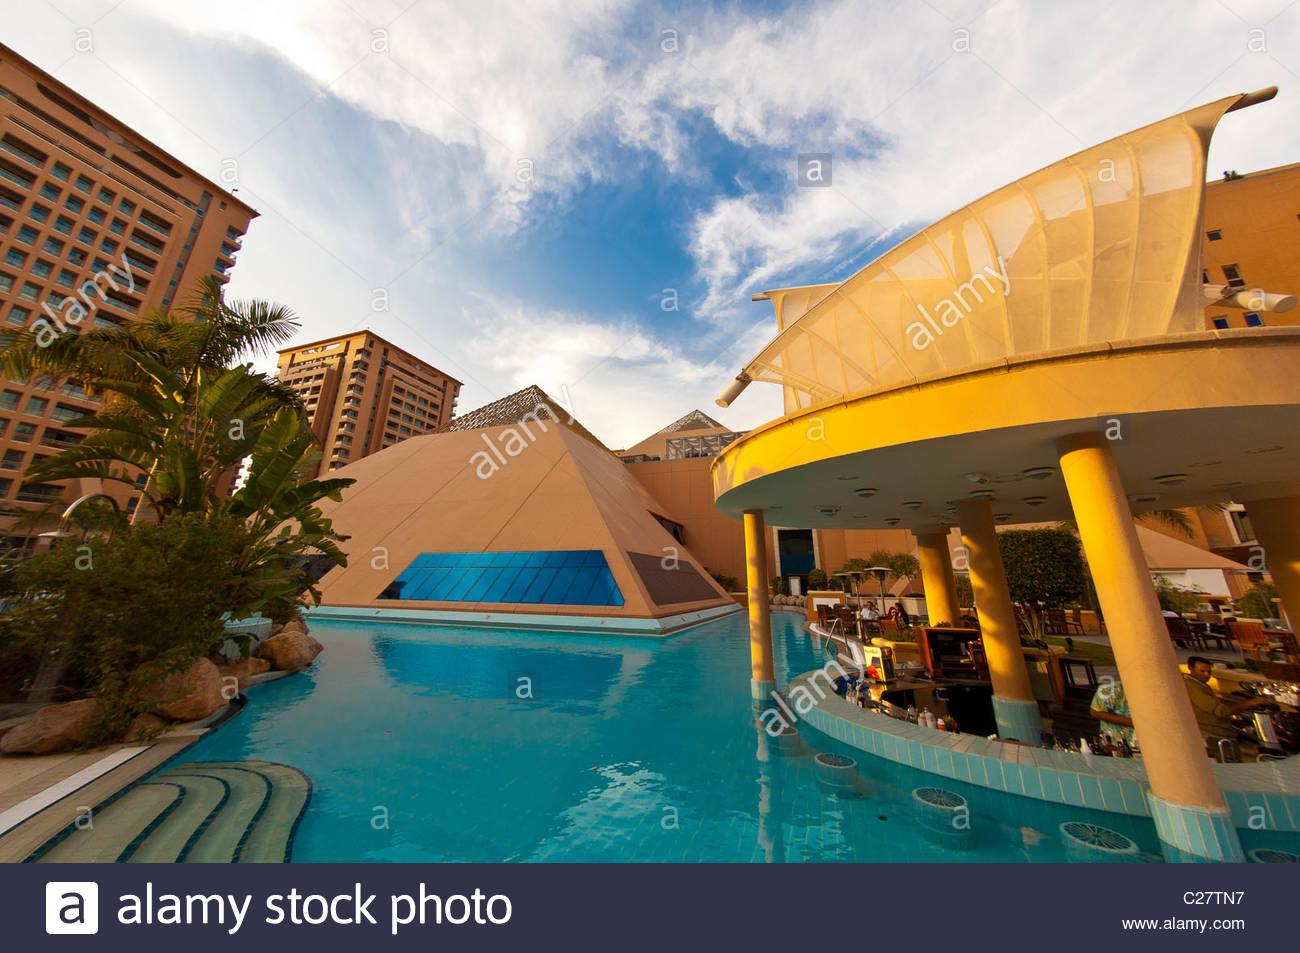 Intercontinental hotel egypt stock photos intercontinental hotel egypt stock images alamy for Stars swimming pool tacloban city